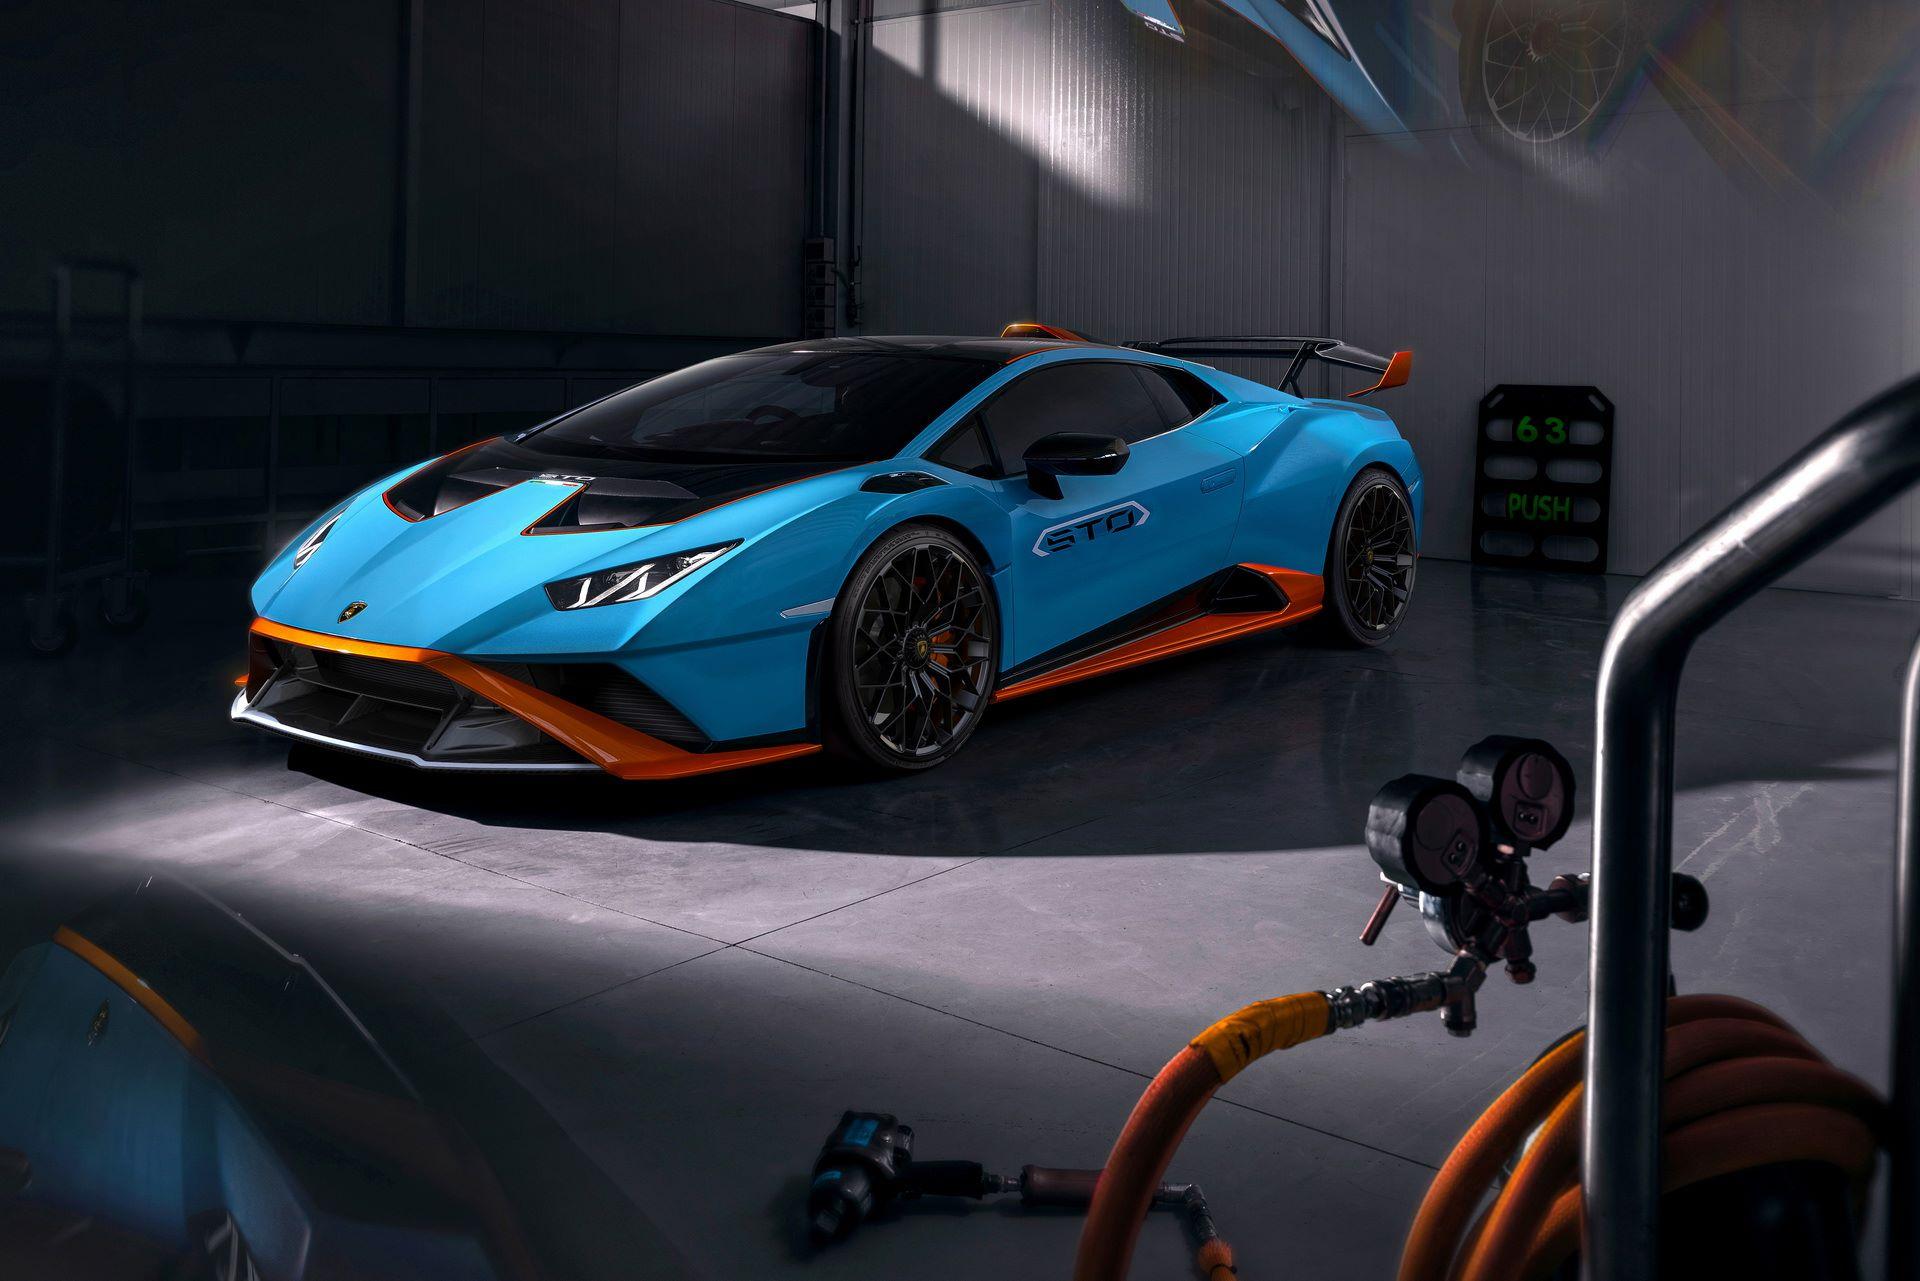 Lamborghini-Huracan-STO-2021-37